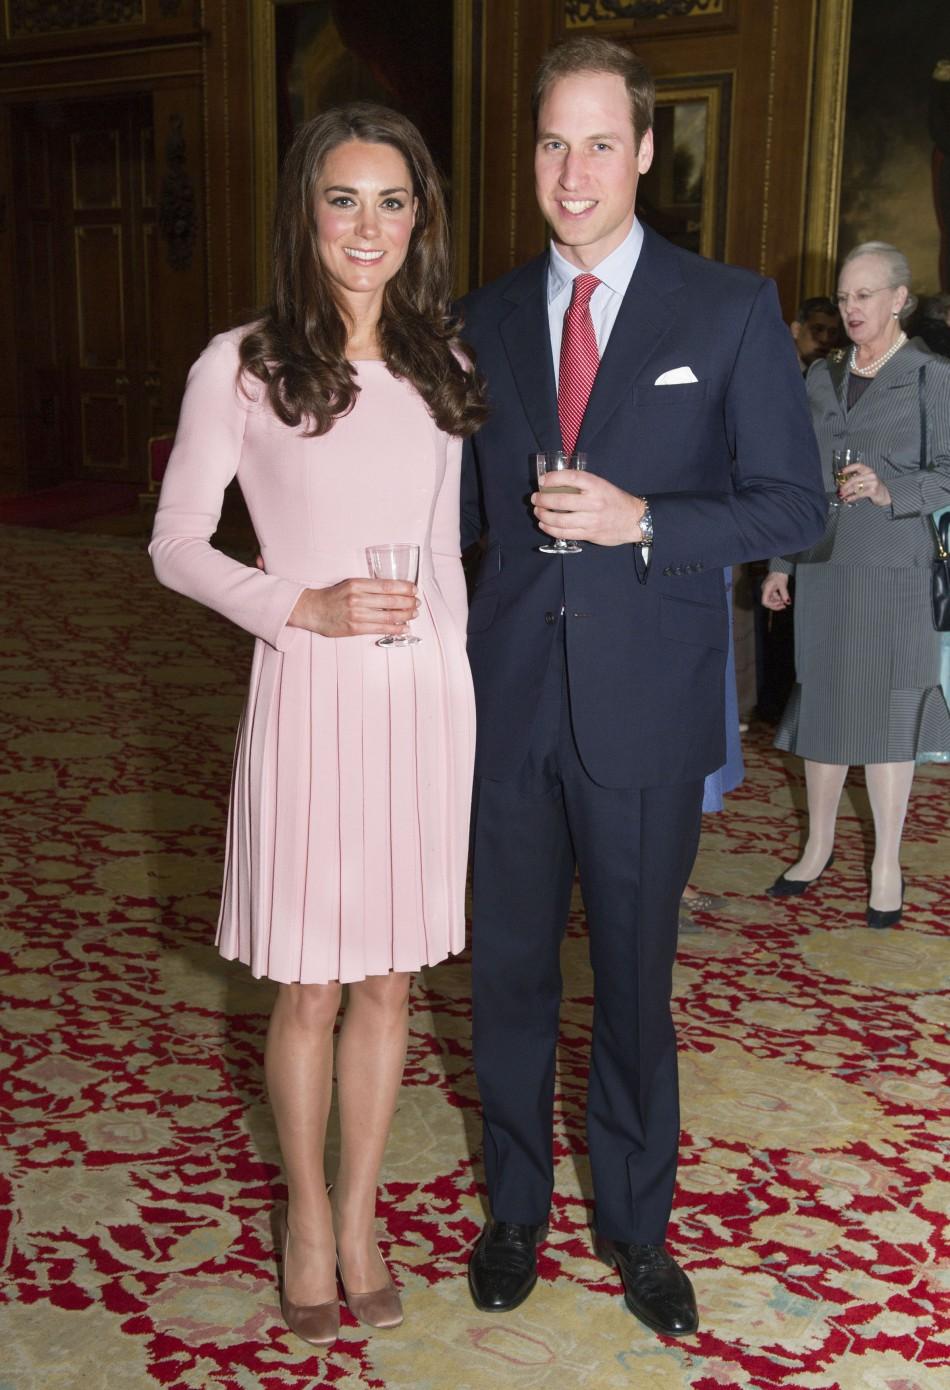 Kate Middleton in her Emilia Wickstead Dress